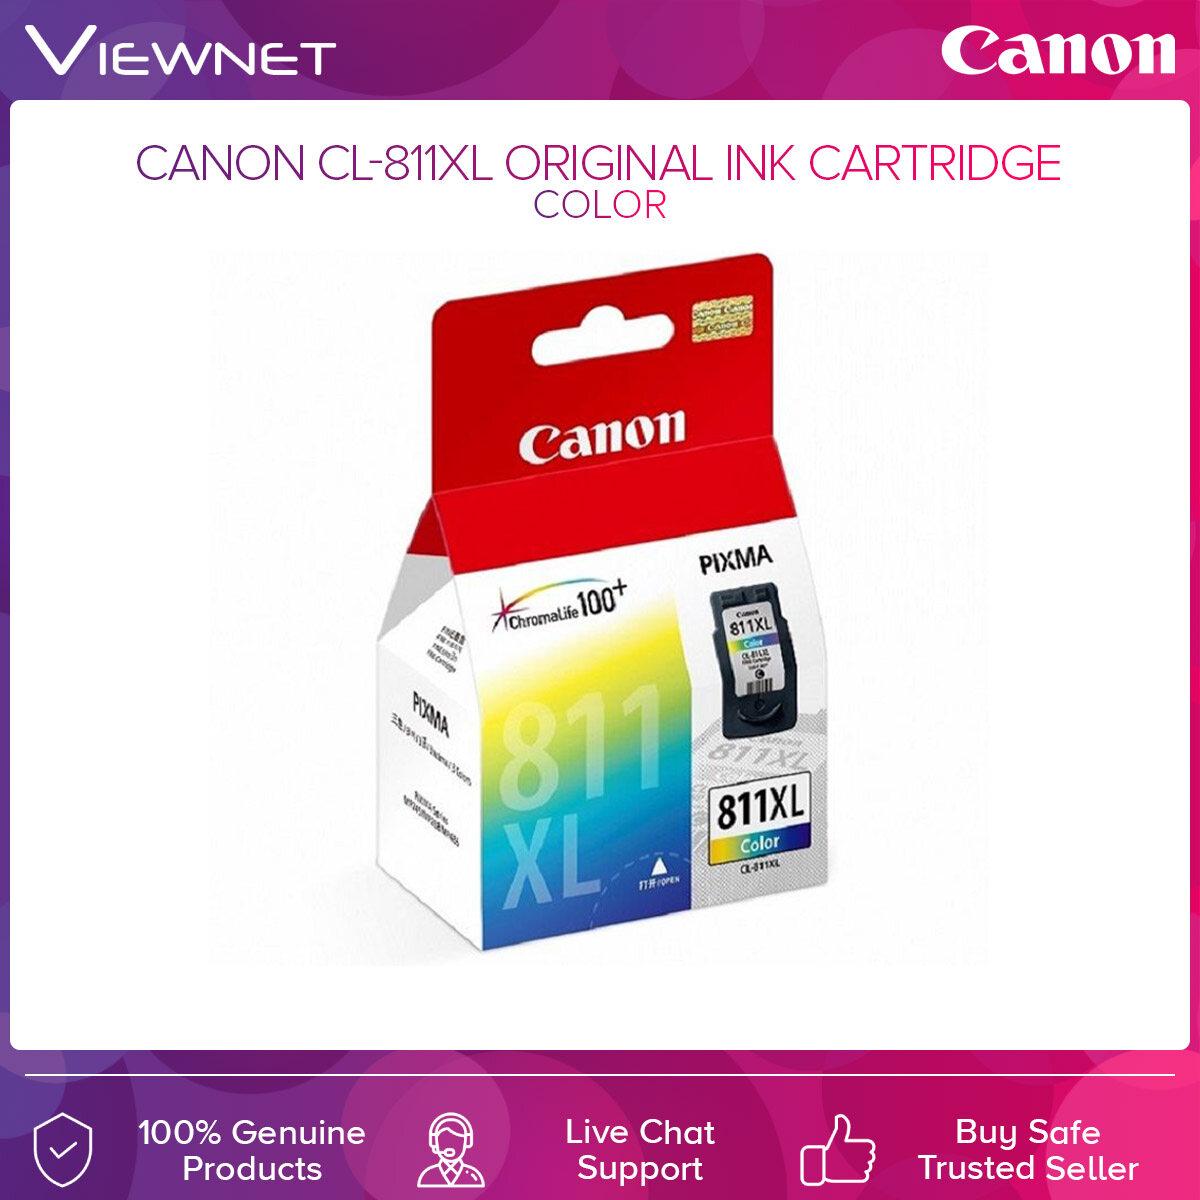 Canon CL 811 XL / PG 810 XL Original Ink Cartridge